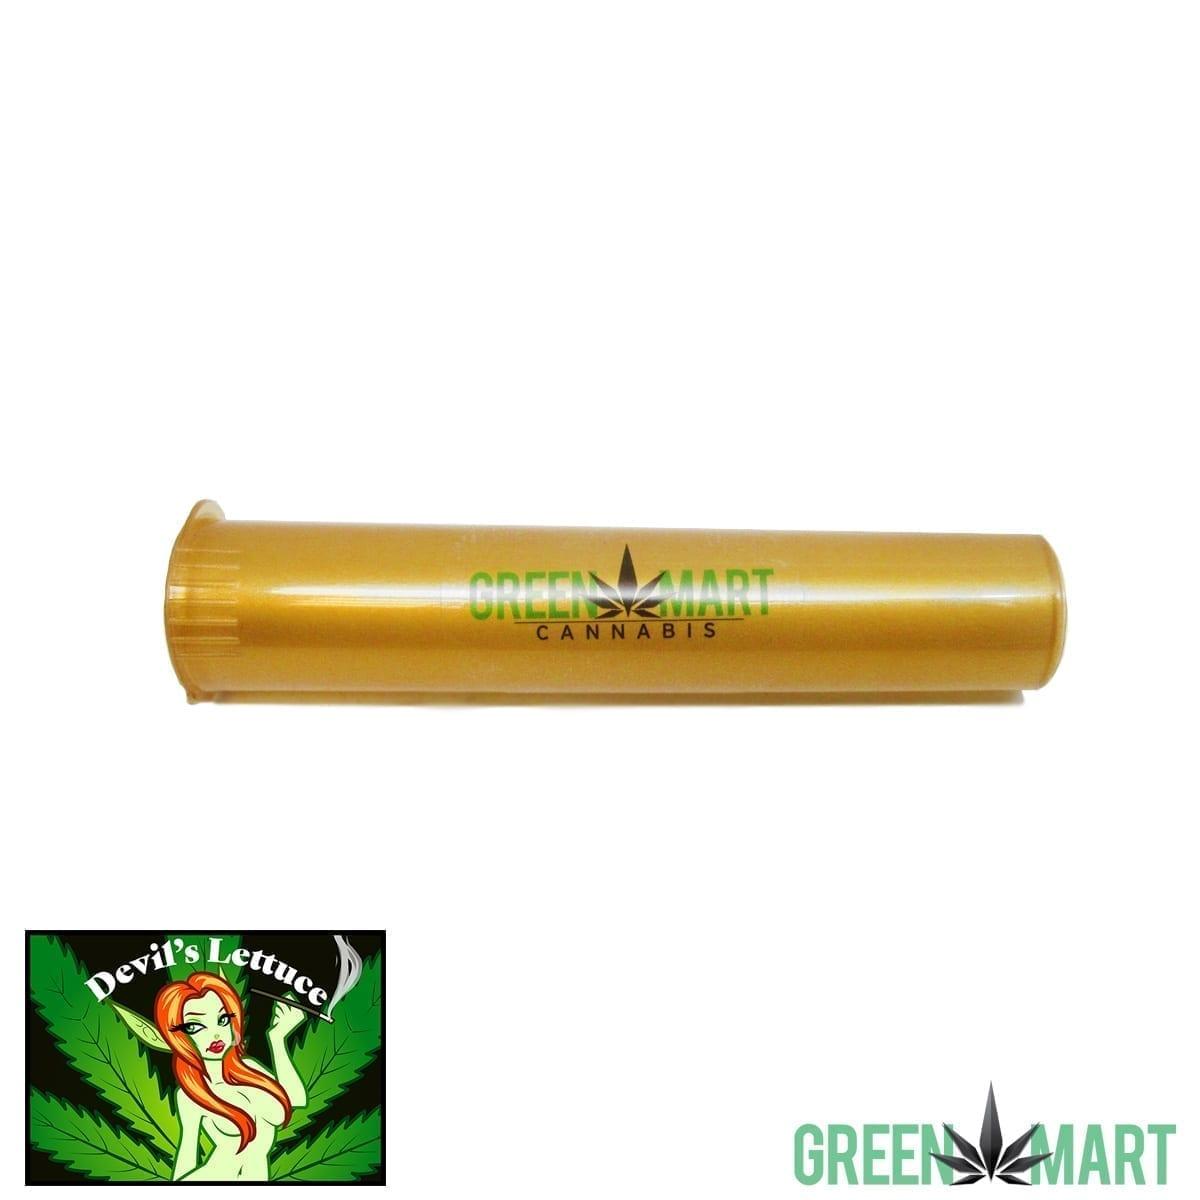 Devil's Lettuce Green Mart Rolled Pre-rolls